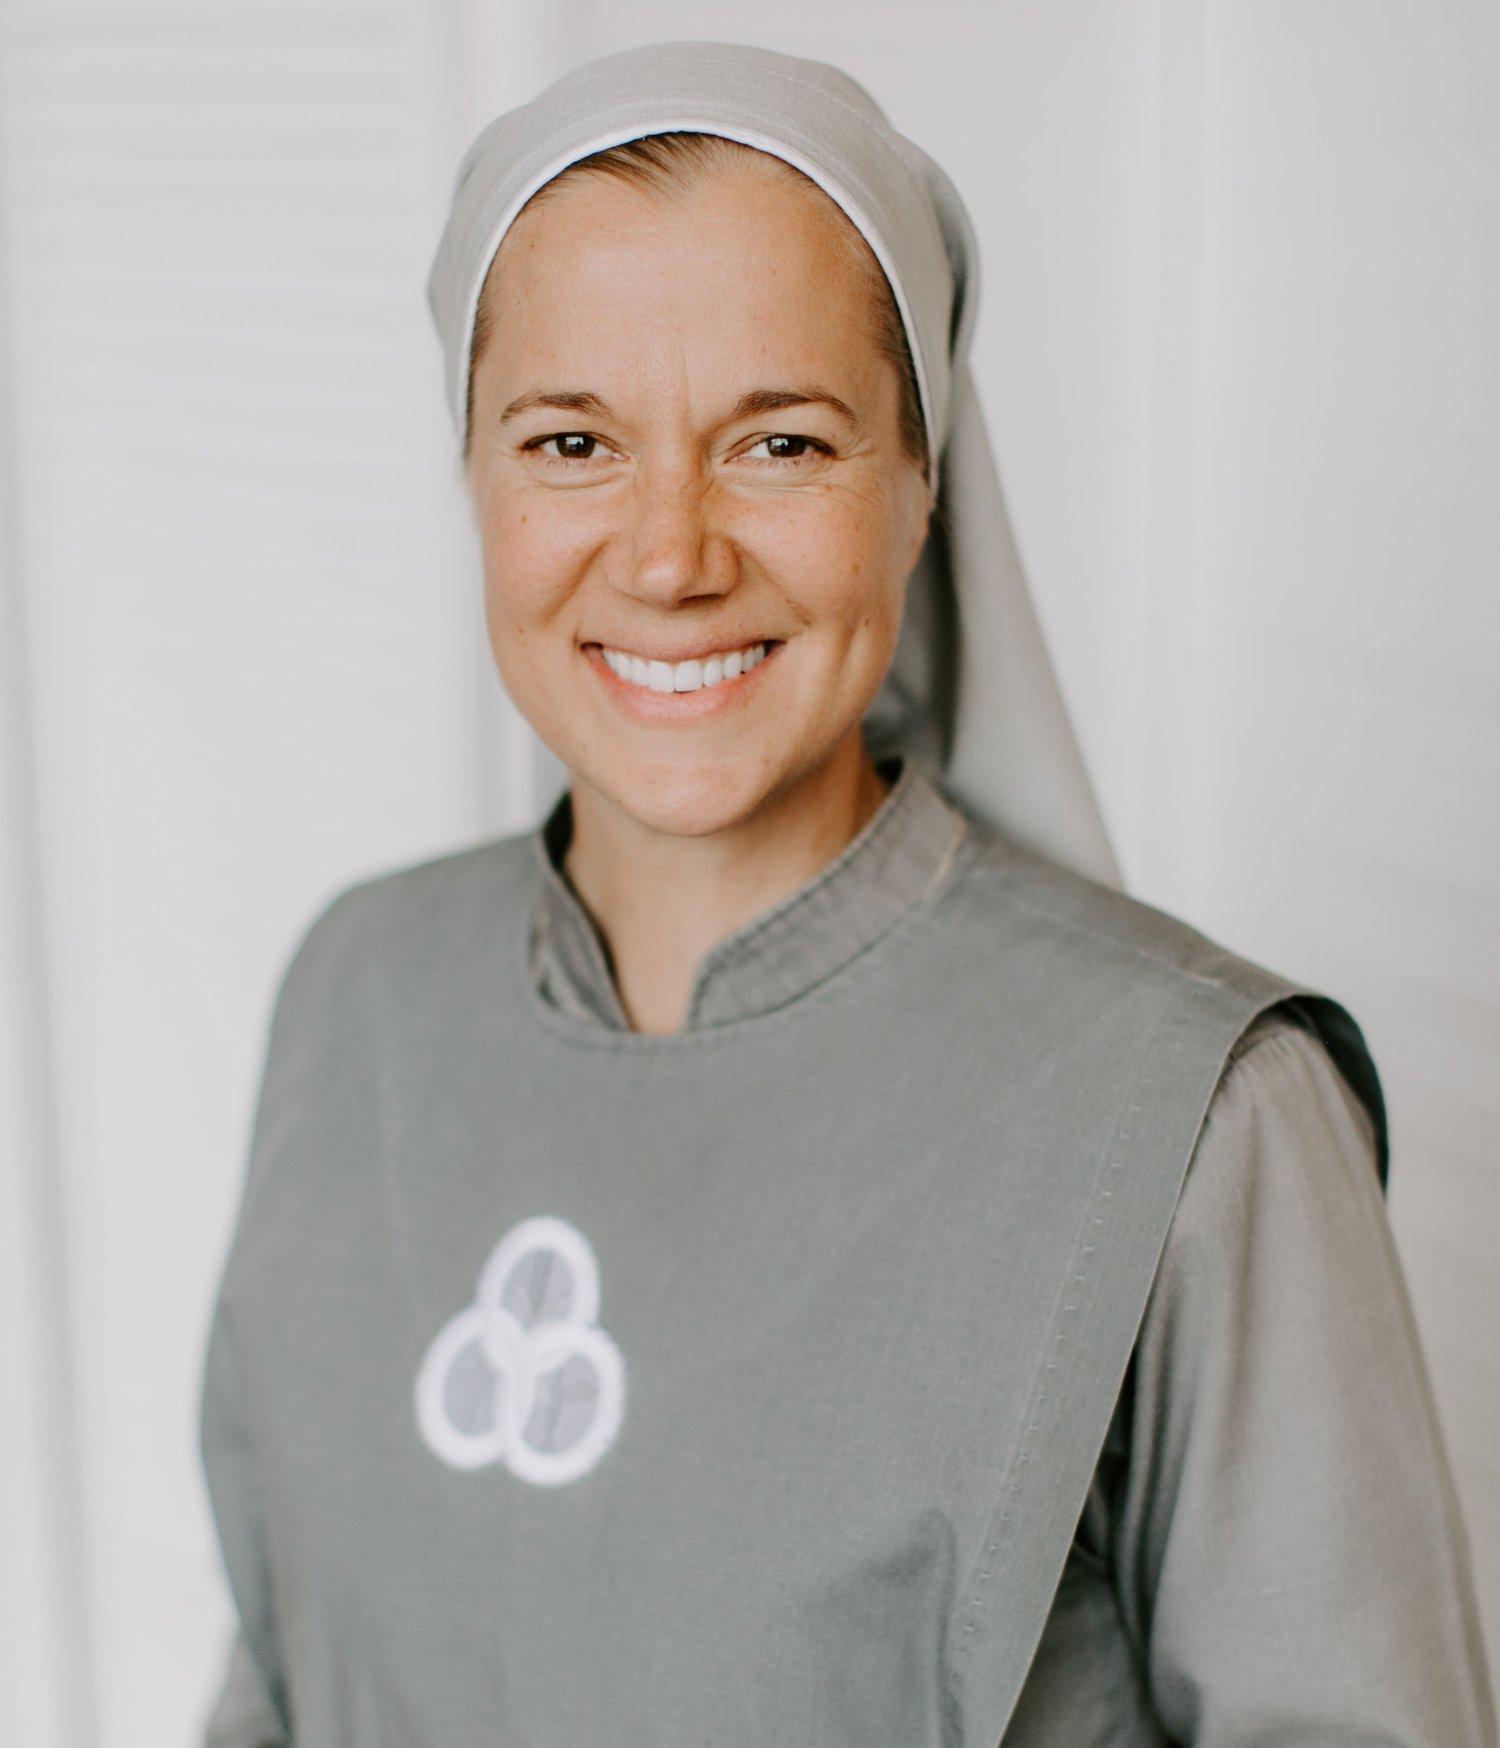 Sr. Miriam Heidland, SOLT